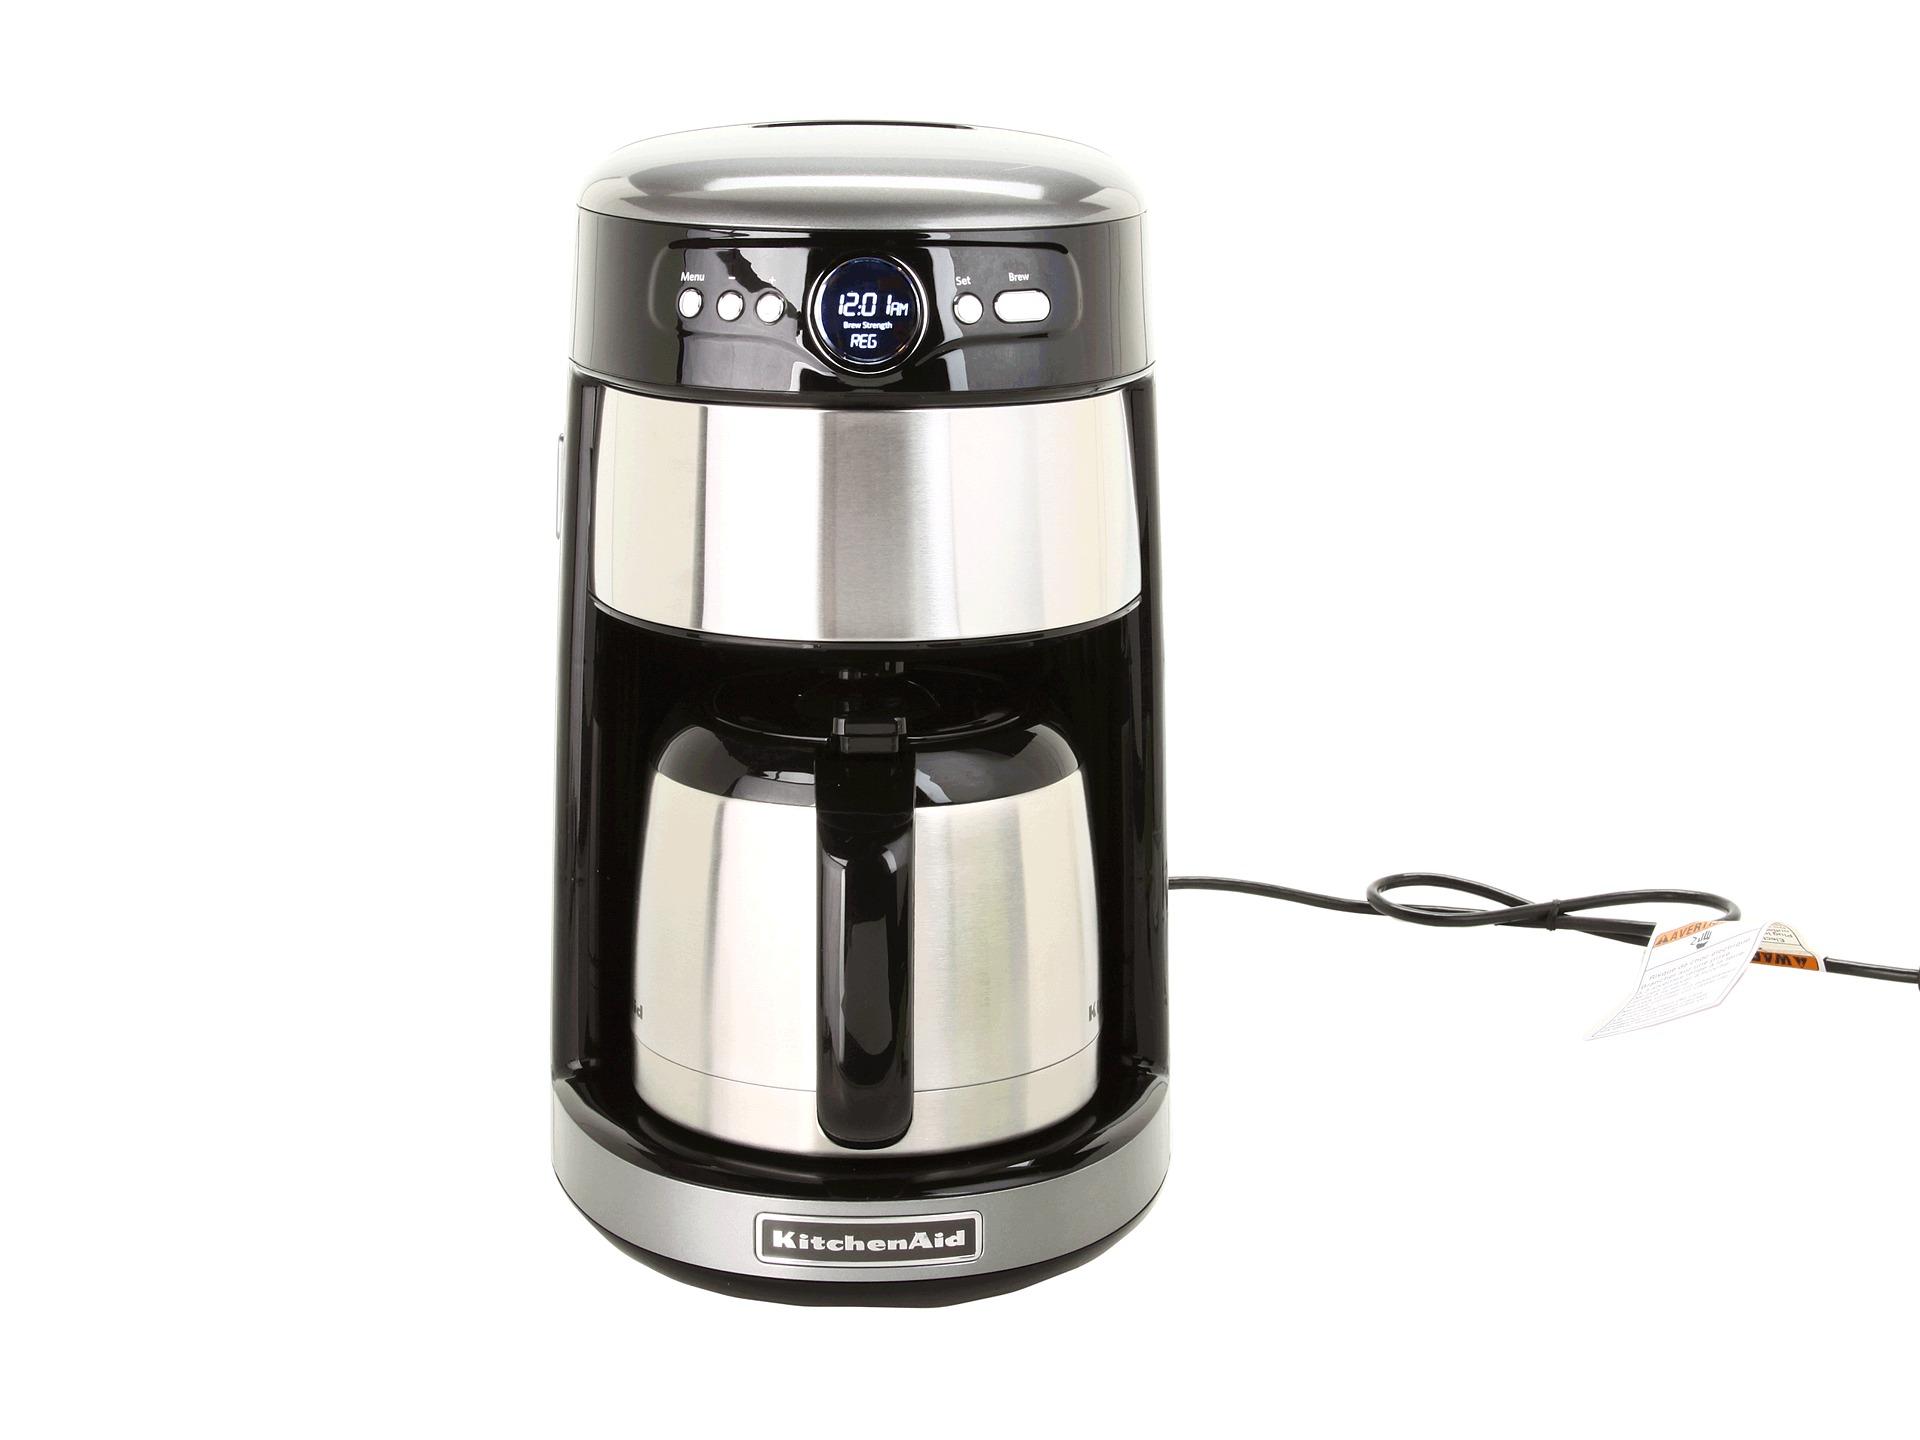 Kitchenaid 12 Cup Thermal Coffee Maker Shipped Free At